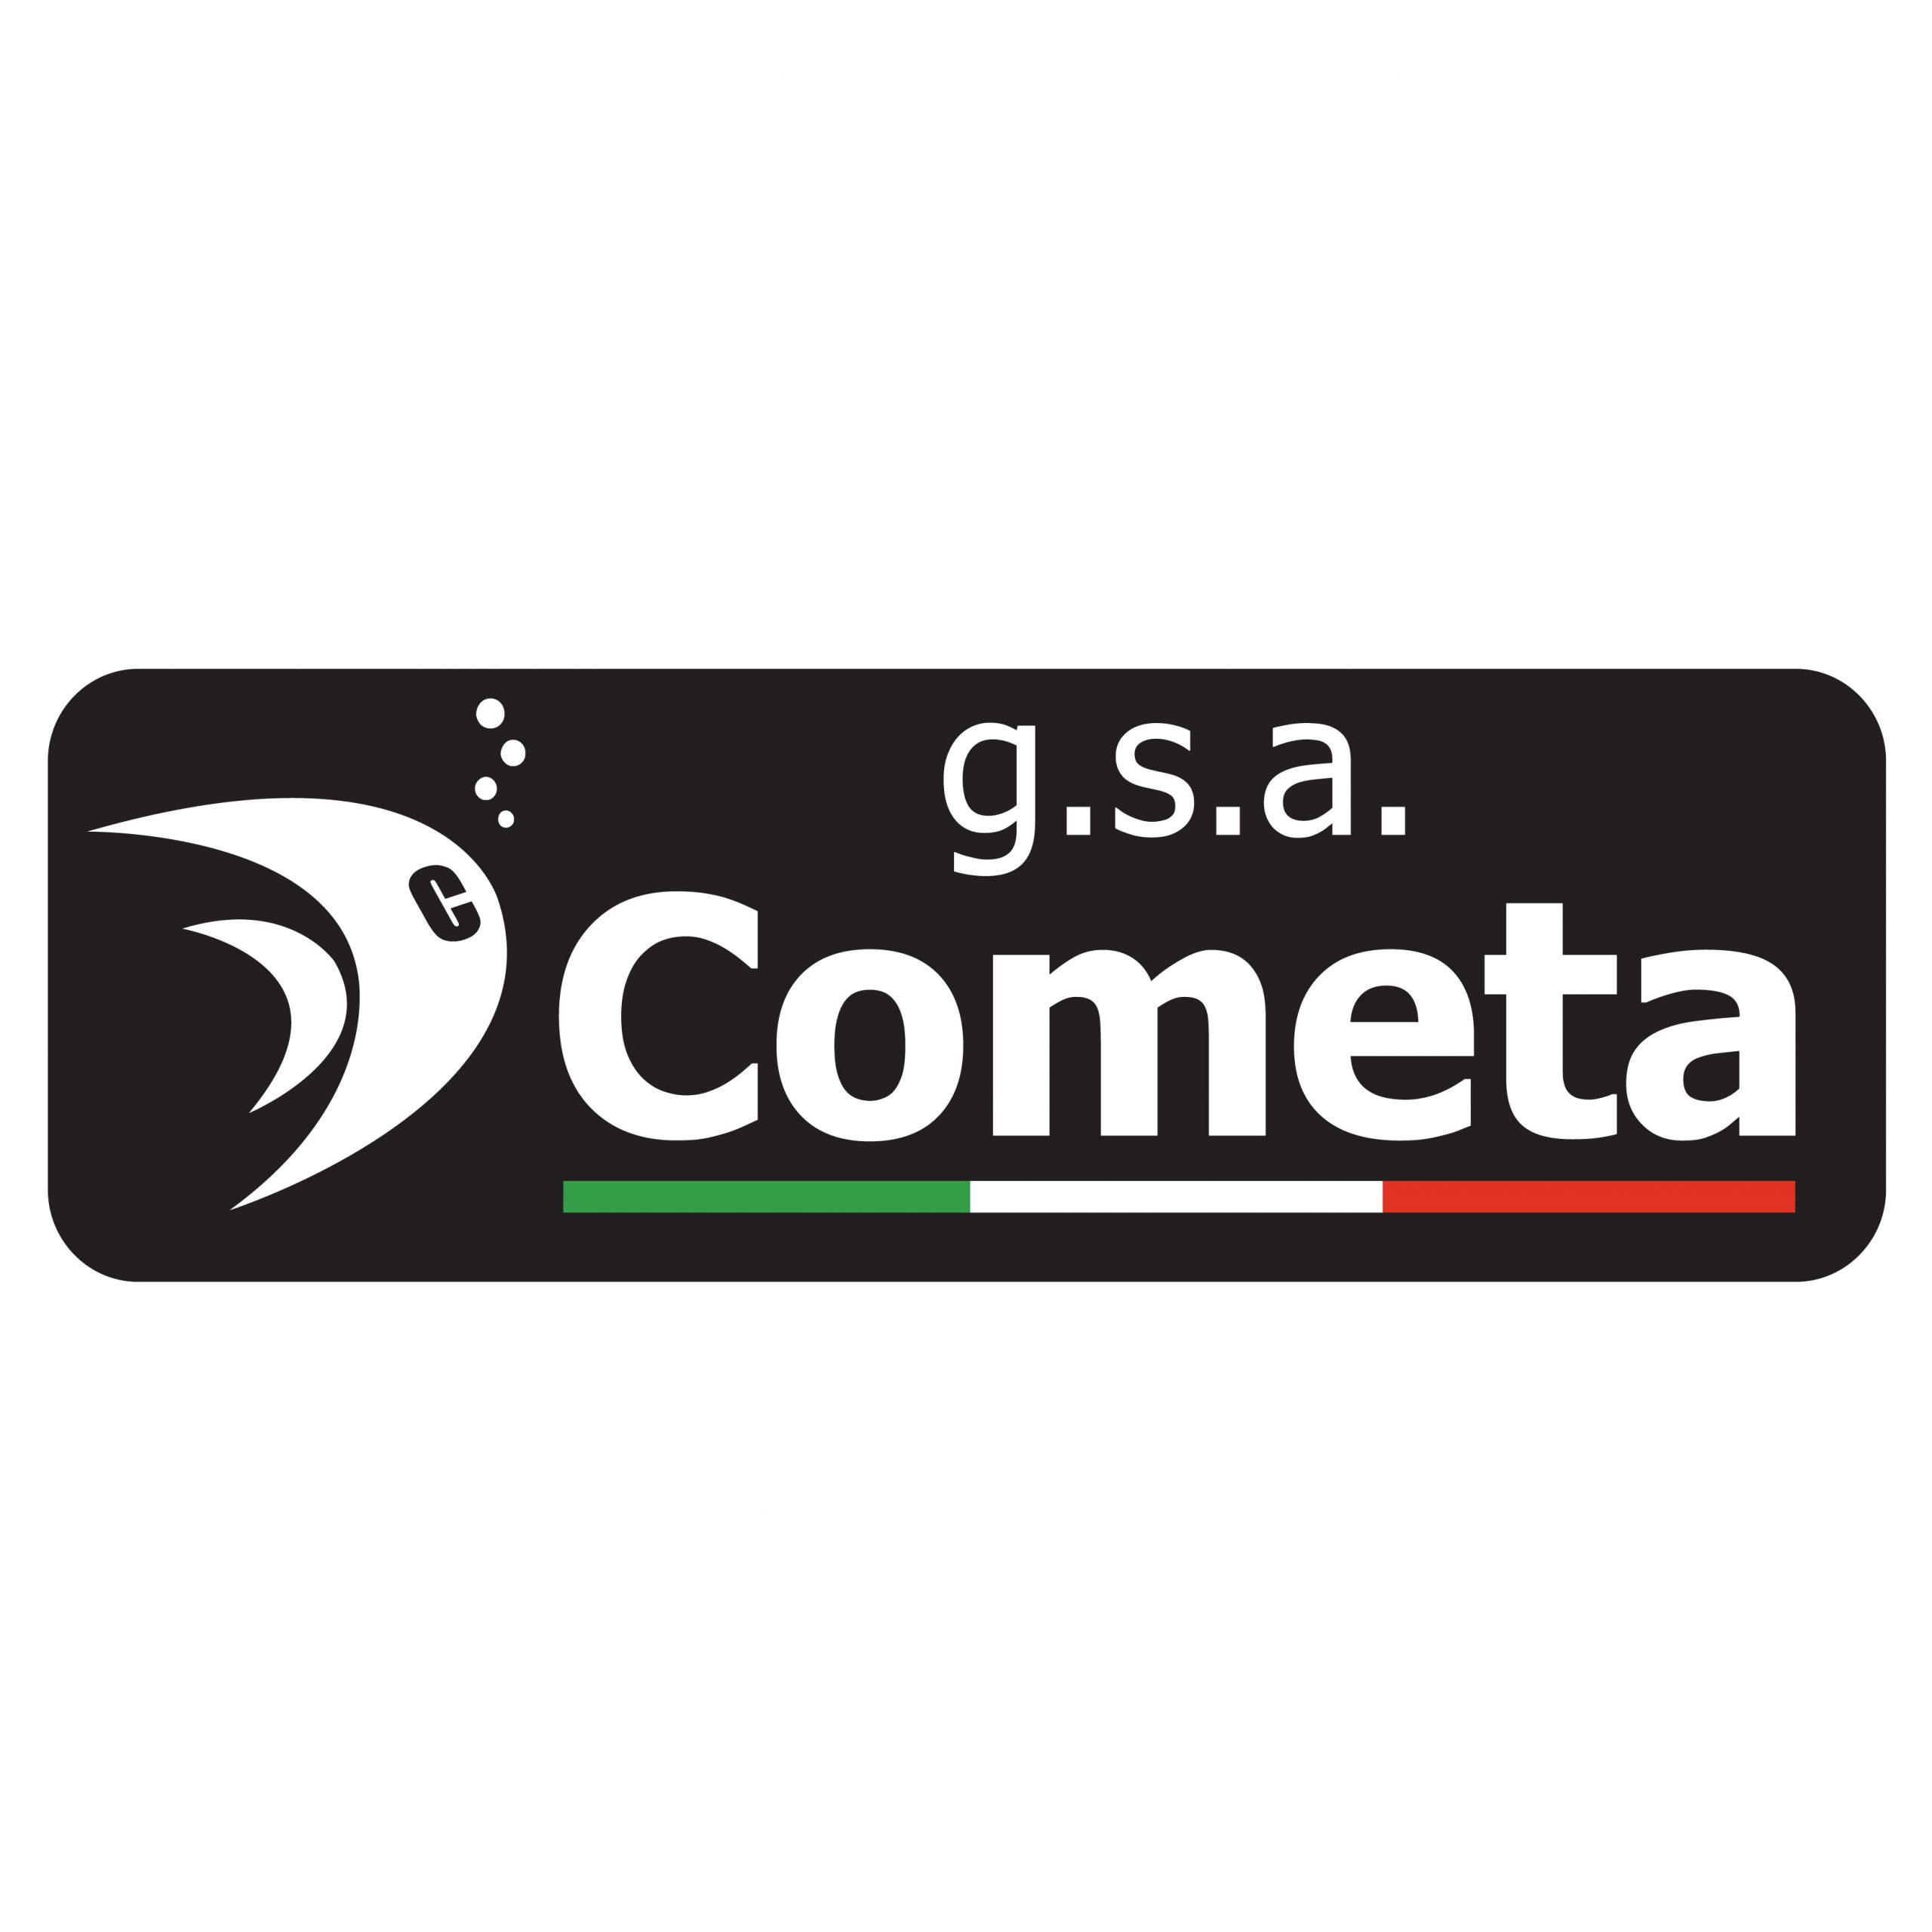 G.S.A COMETA